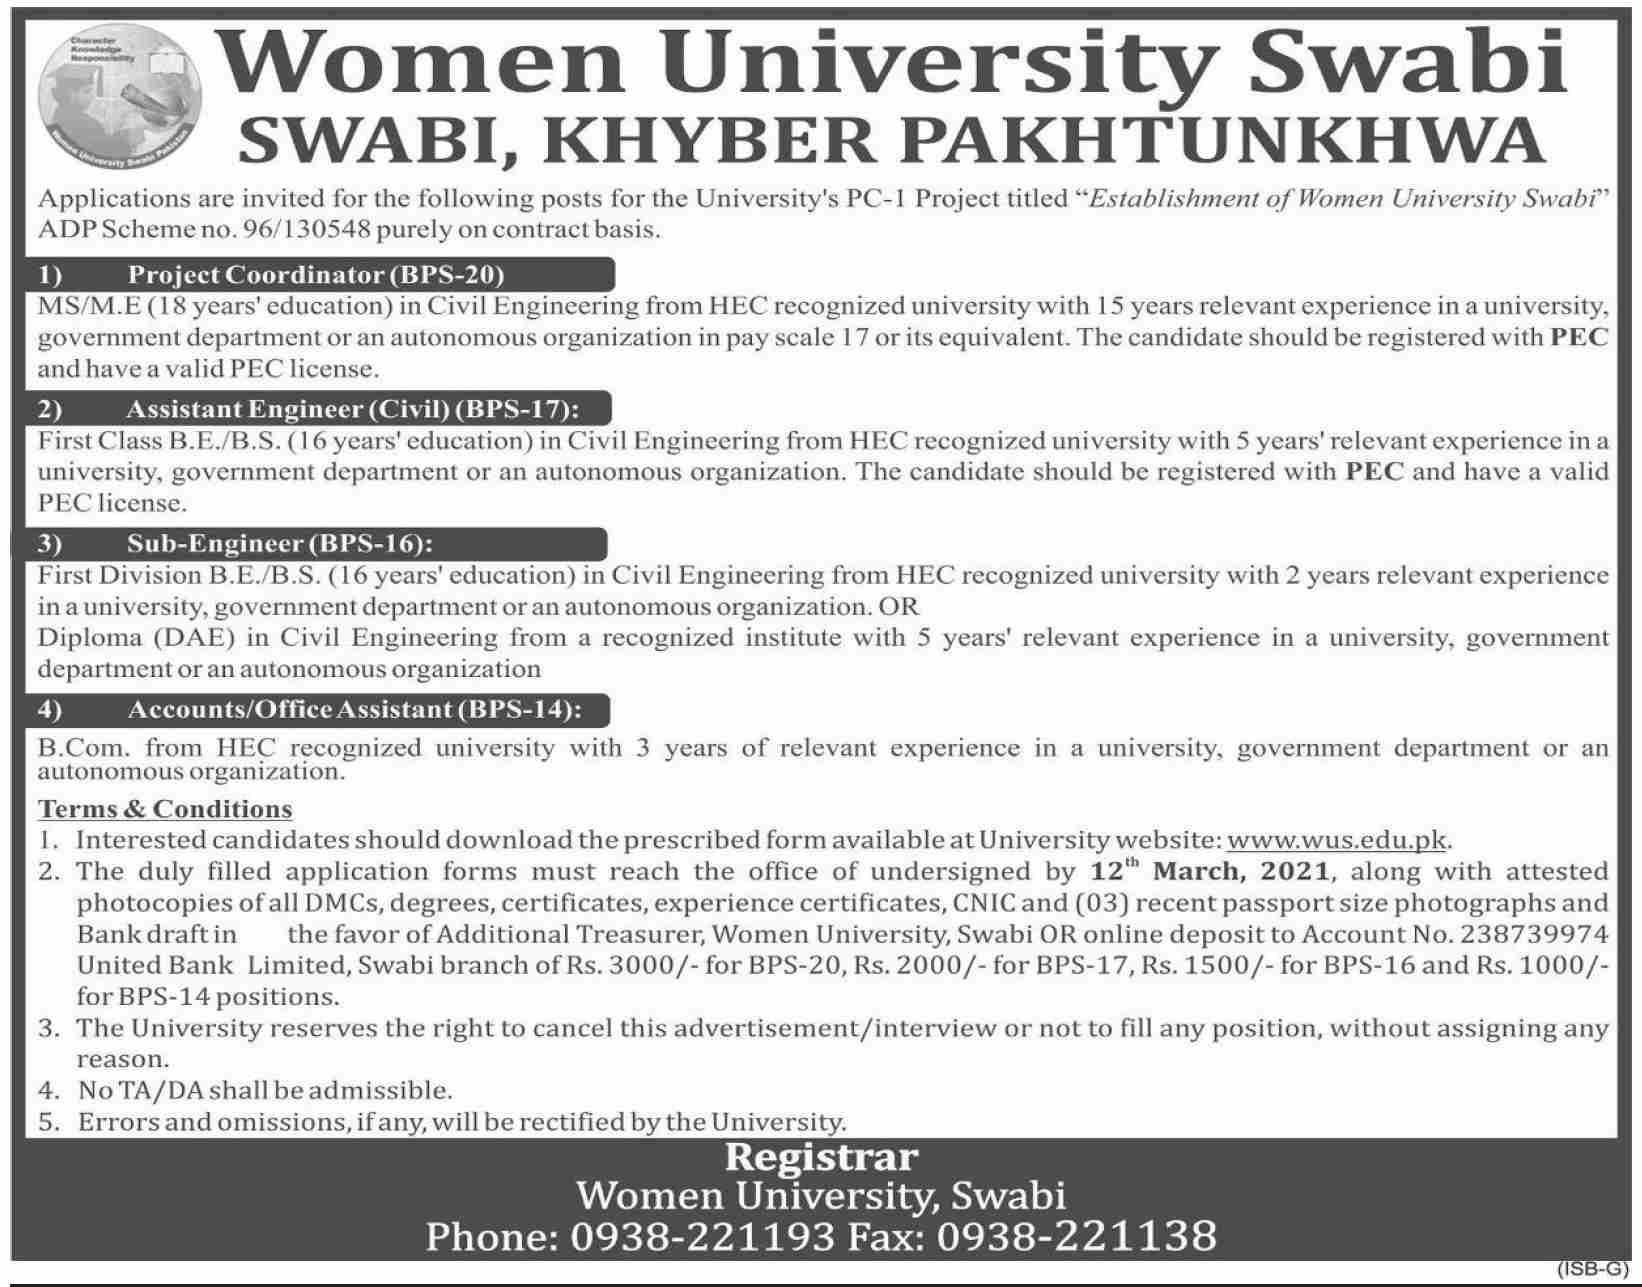 WUS Jobs 2021 - Women University Swabi Jobs 2021 - KPK Jobs 2021 - Download Women University Swabi WUS Jobs 2021 Application Form :- www.wus.edu.pk